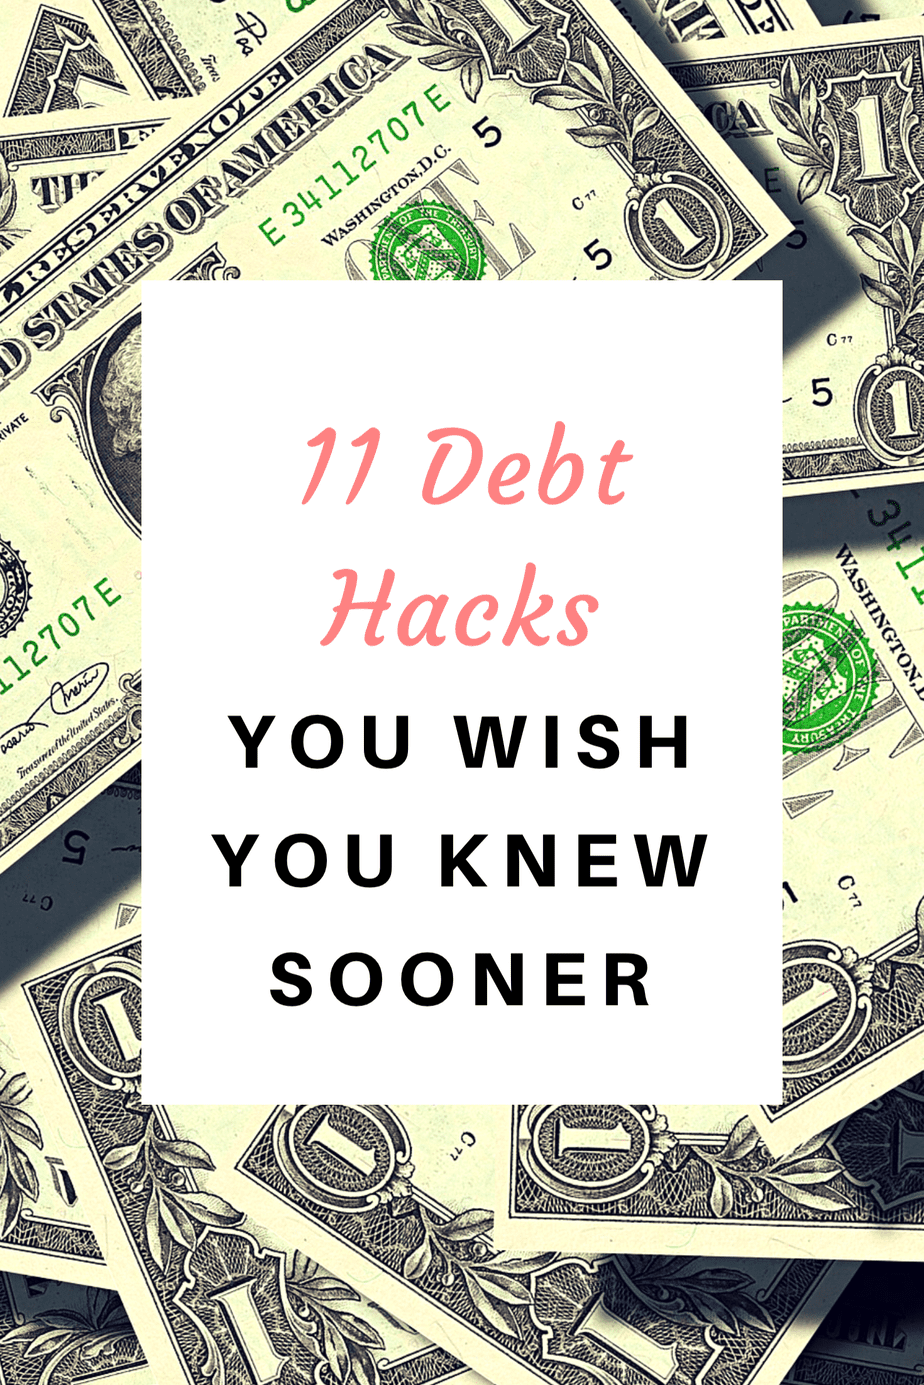 Debt hacks